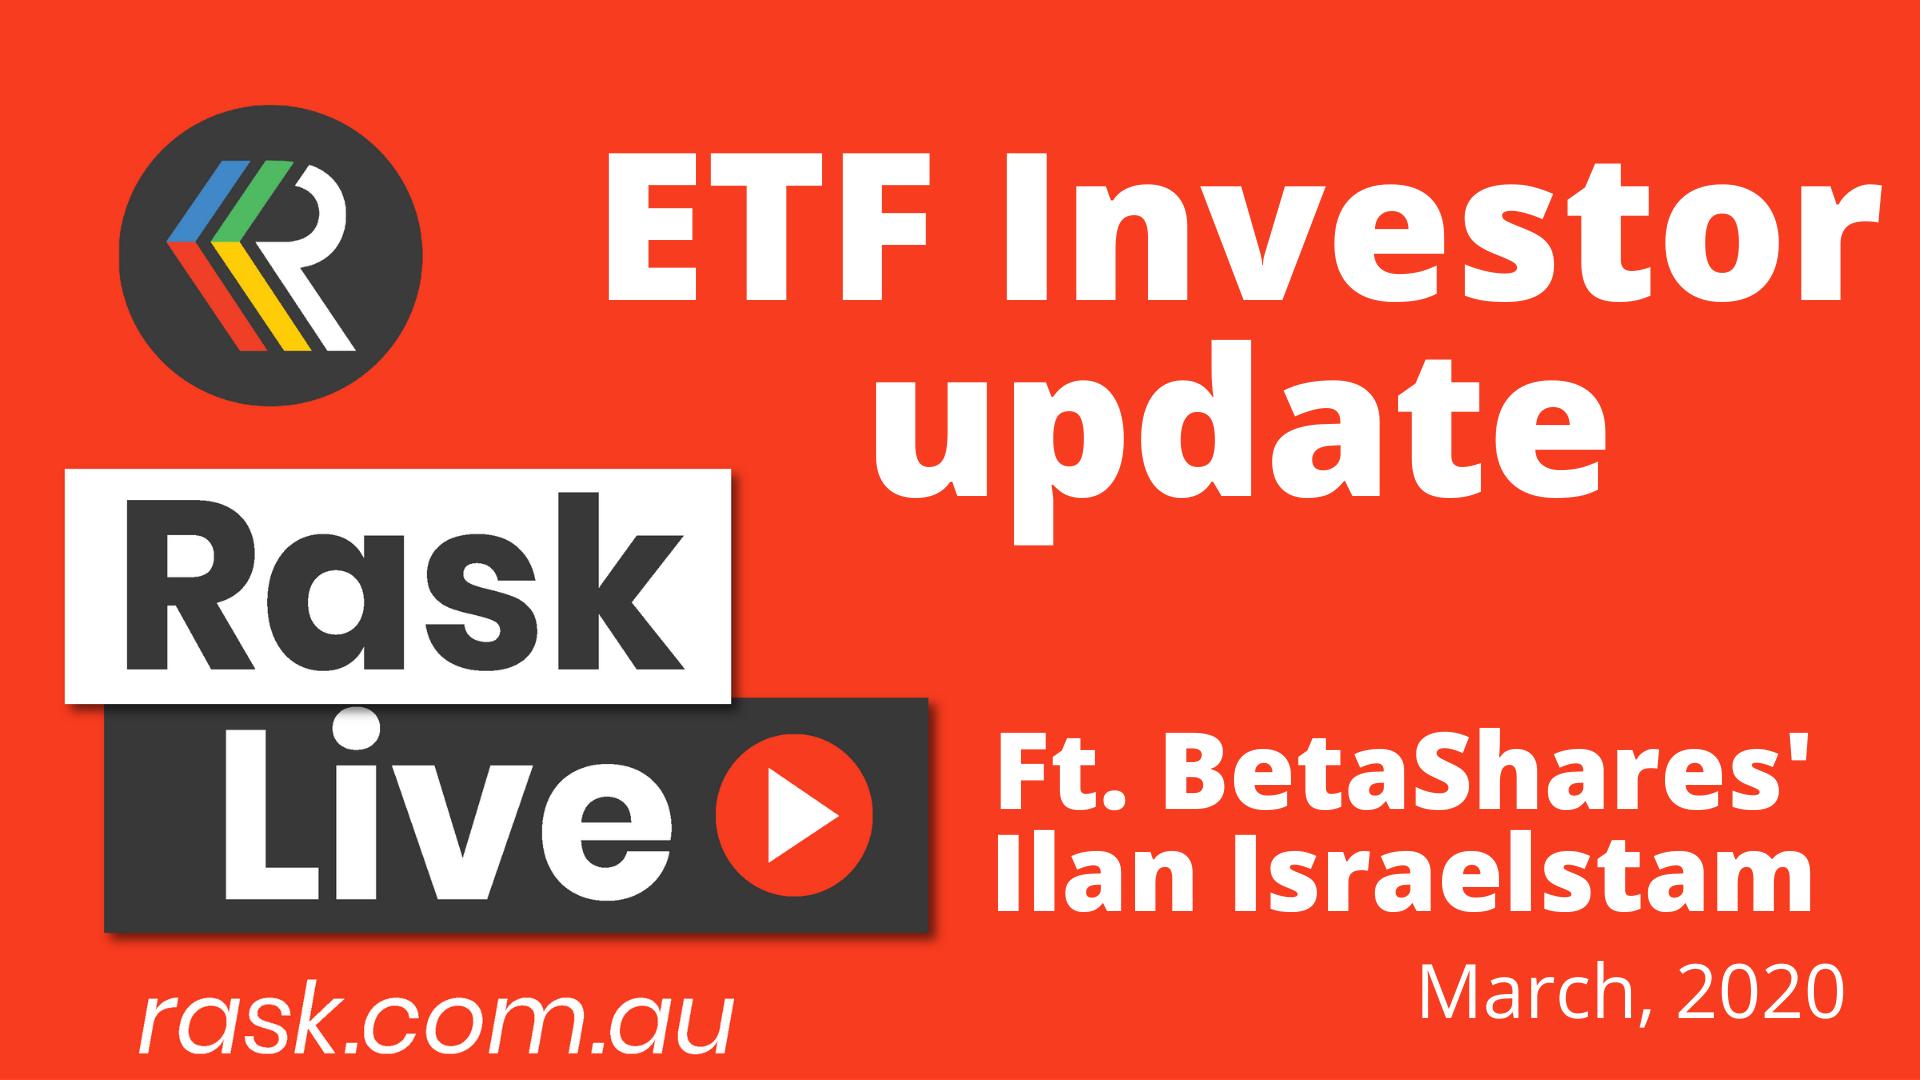 Rask Live - ASX ETF investor update